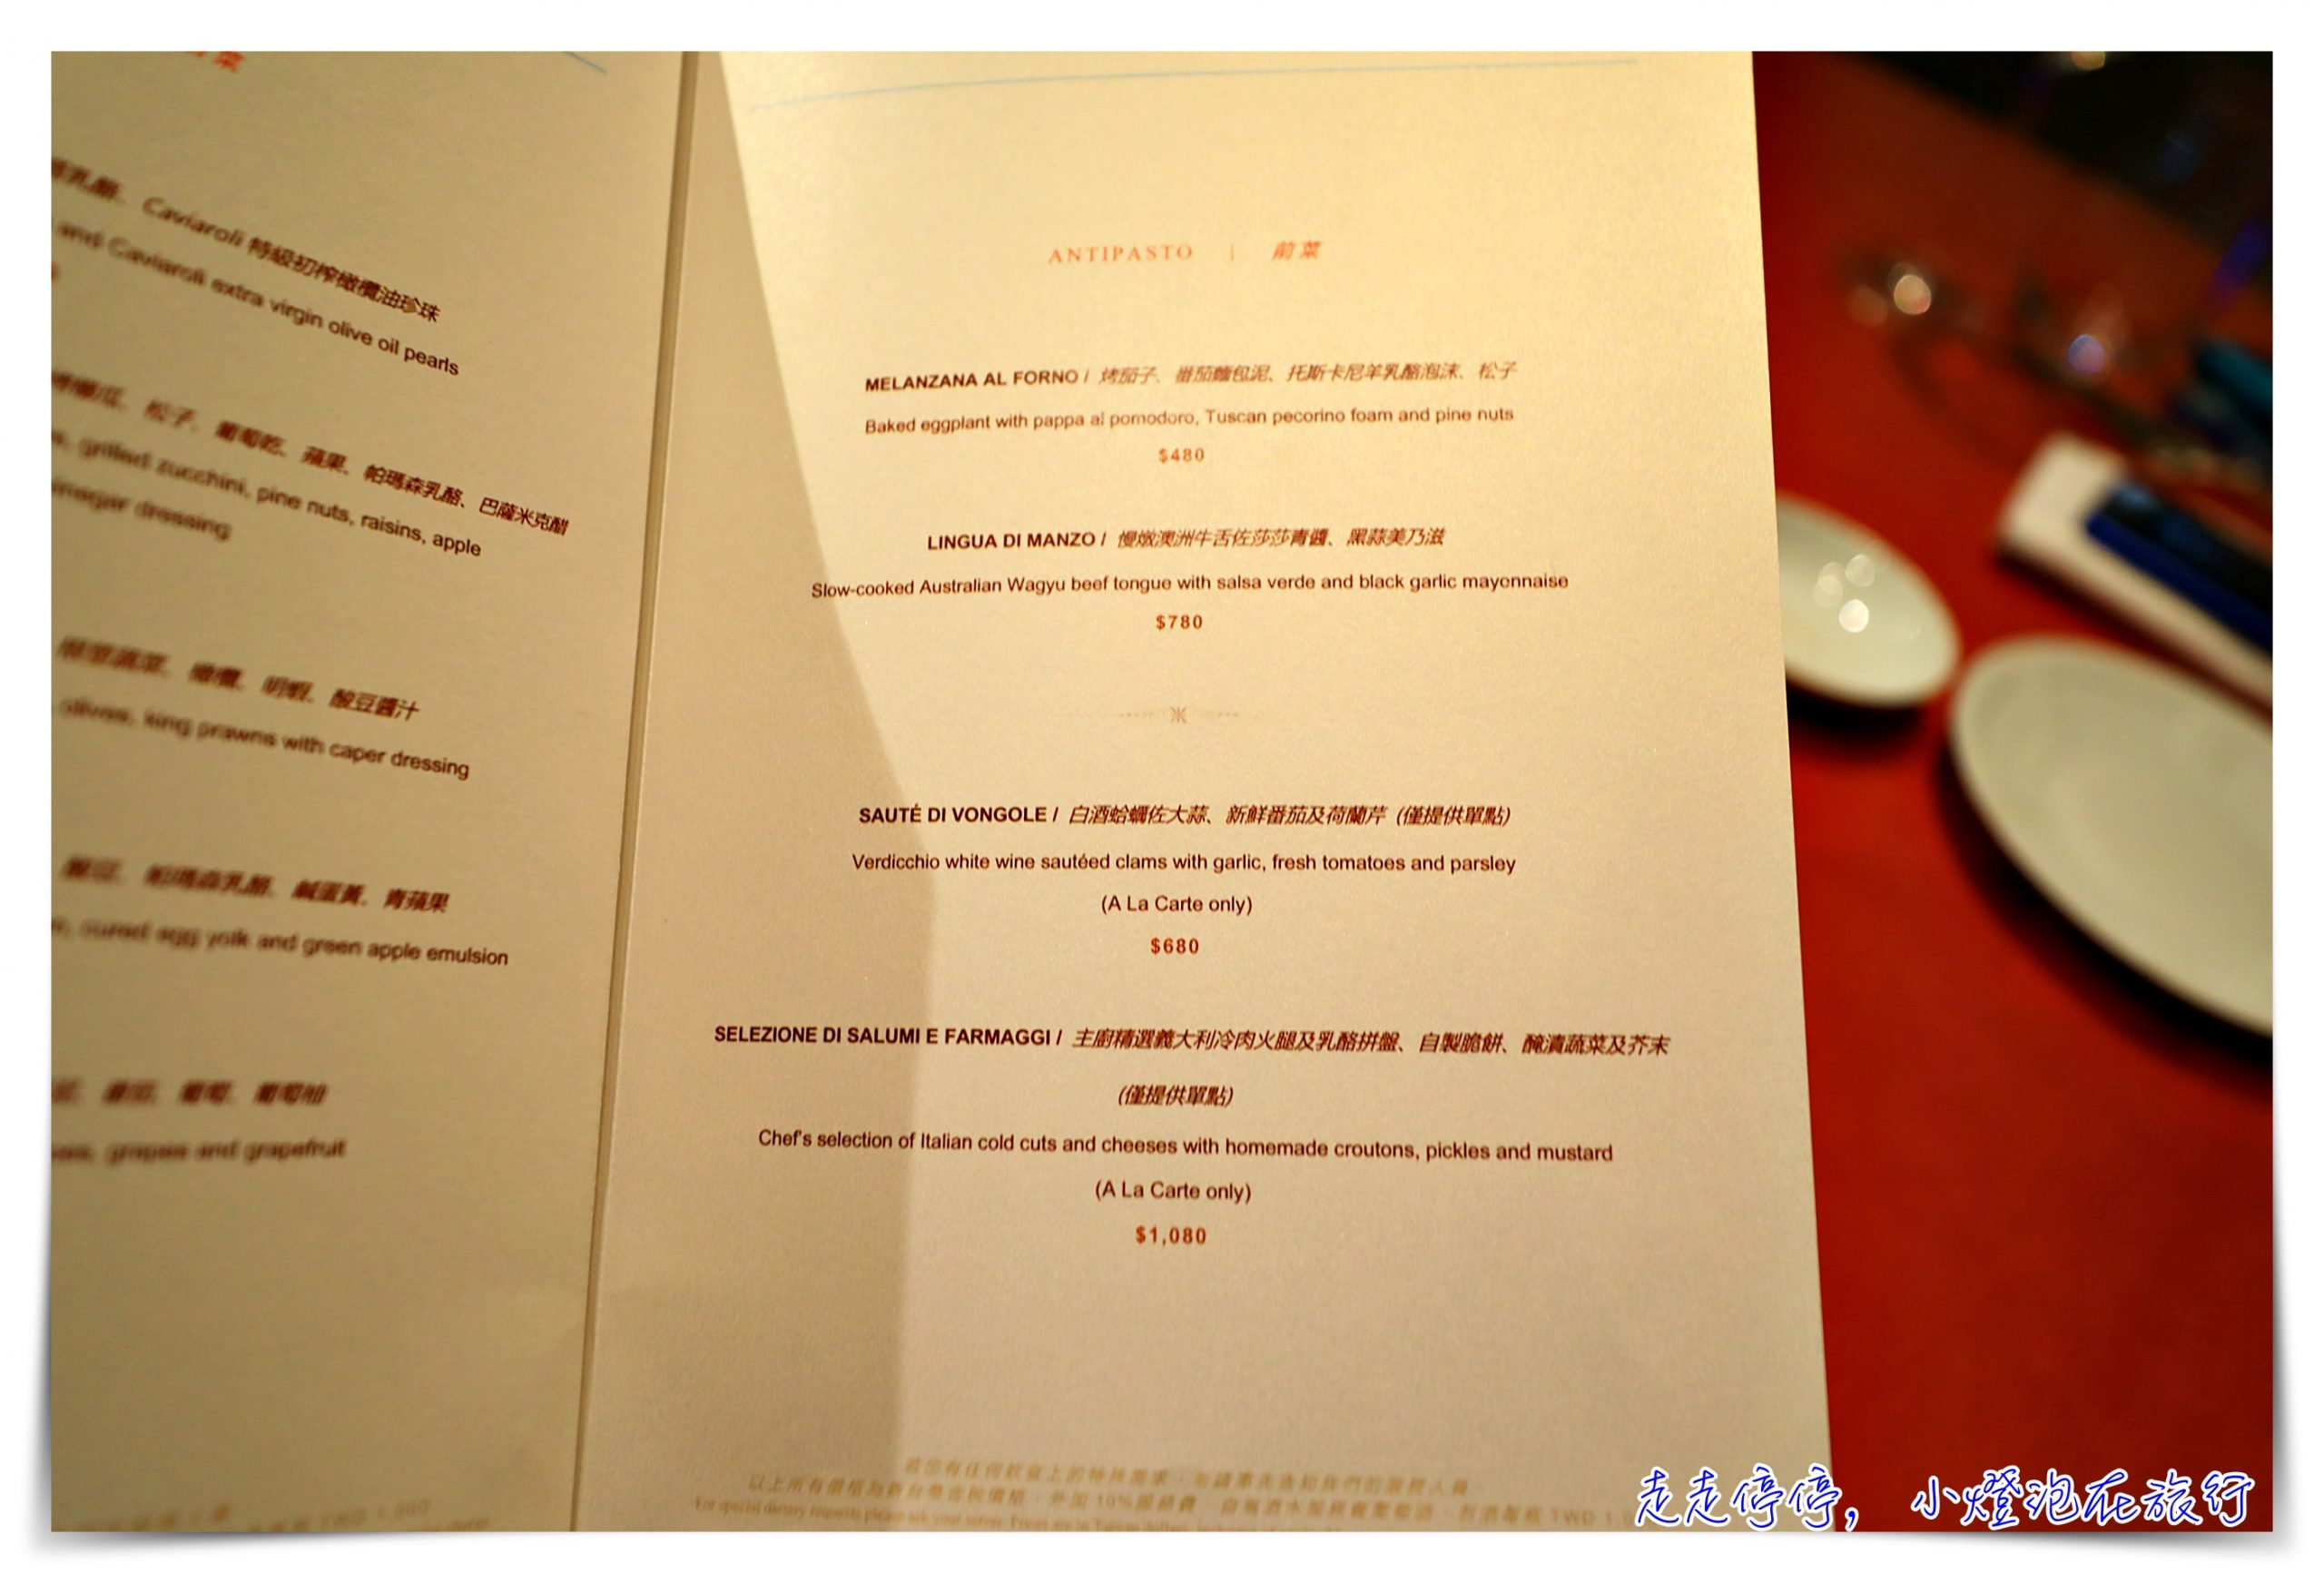 Bencotto|台北最值得期待義大利餐廳,文華東方酒店質感用餐